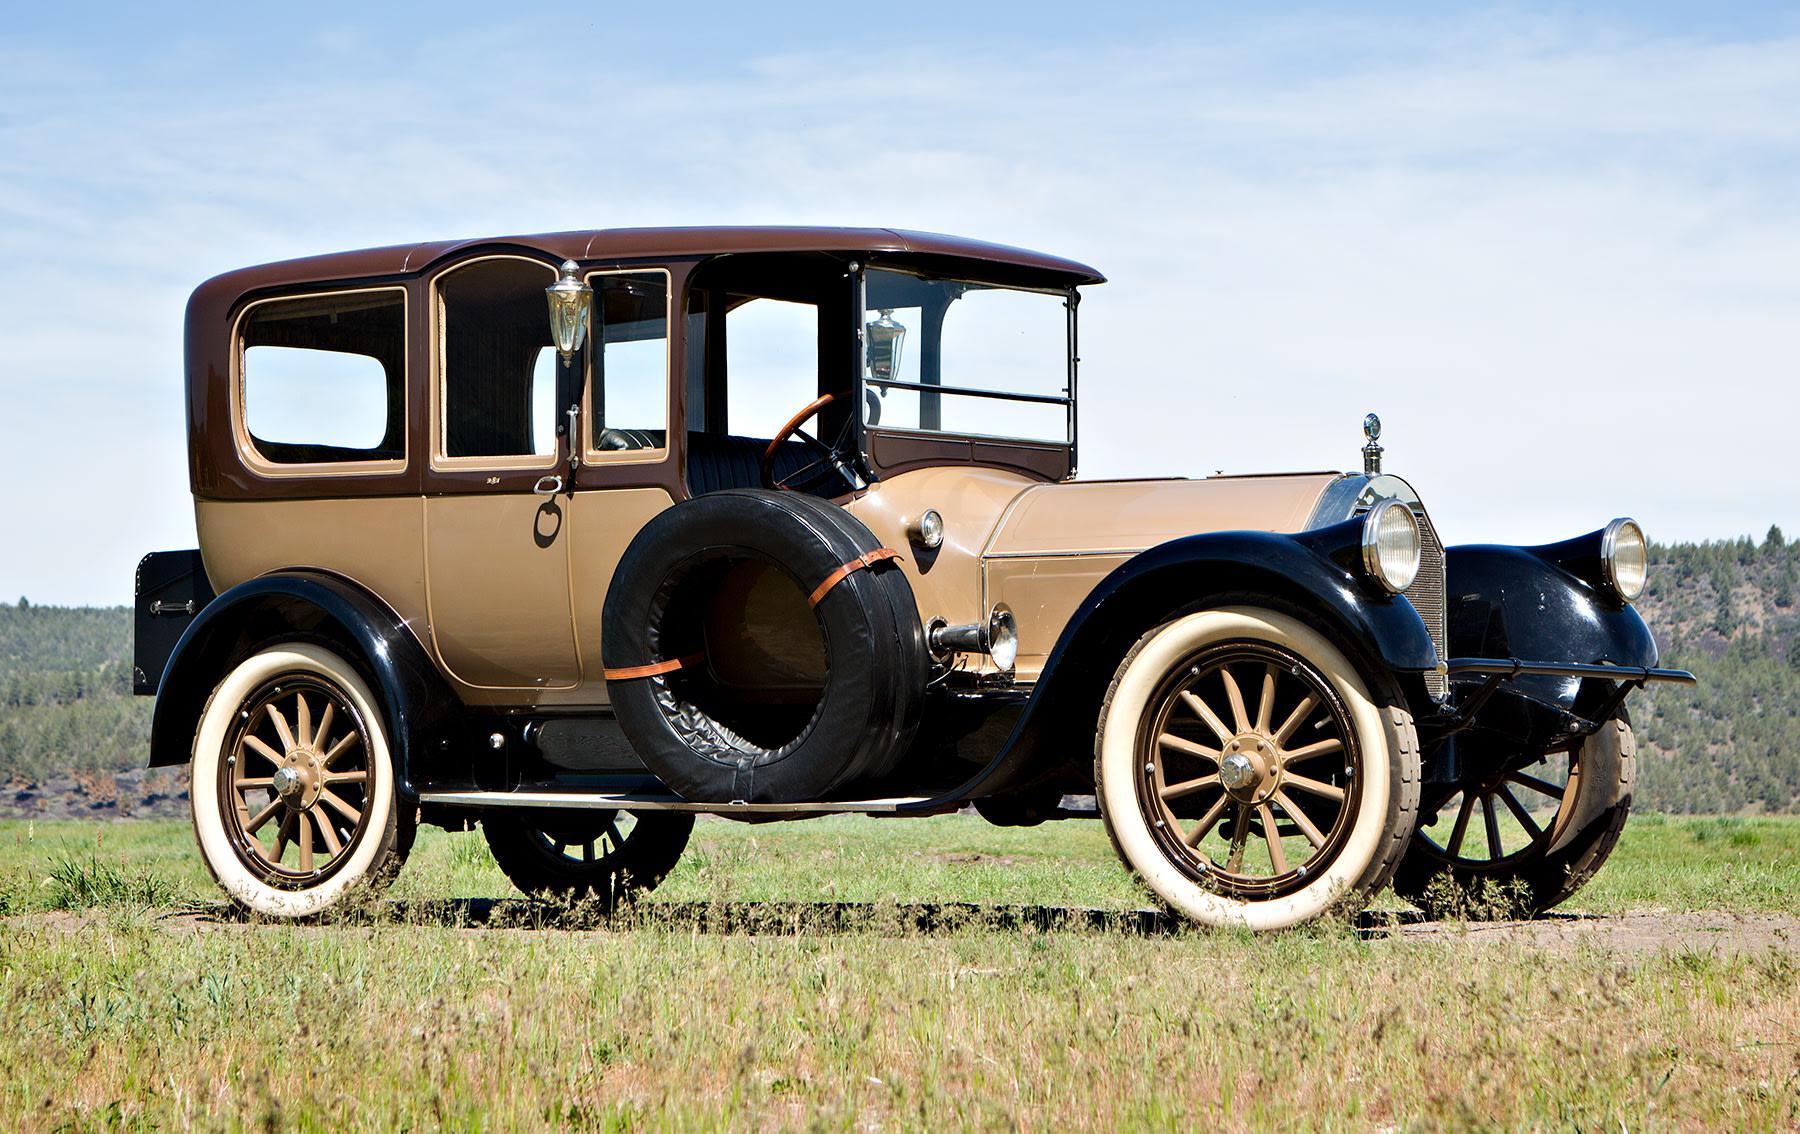 1915 Pierce-Arrow Model 48 Seven-Passenger Suburban